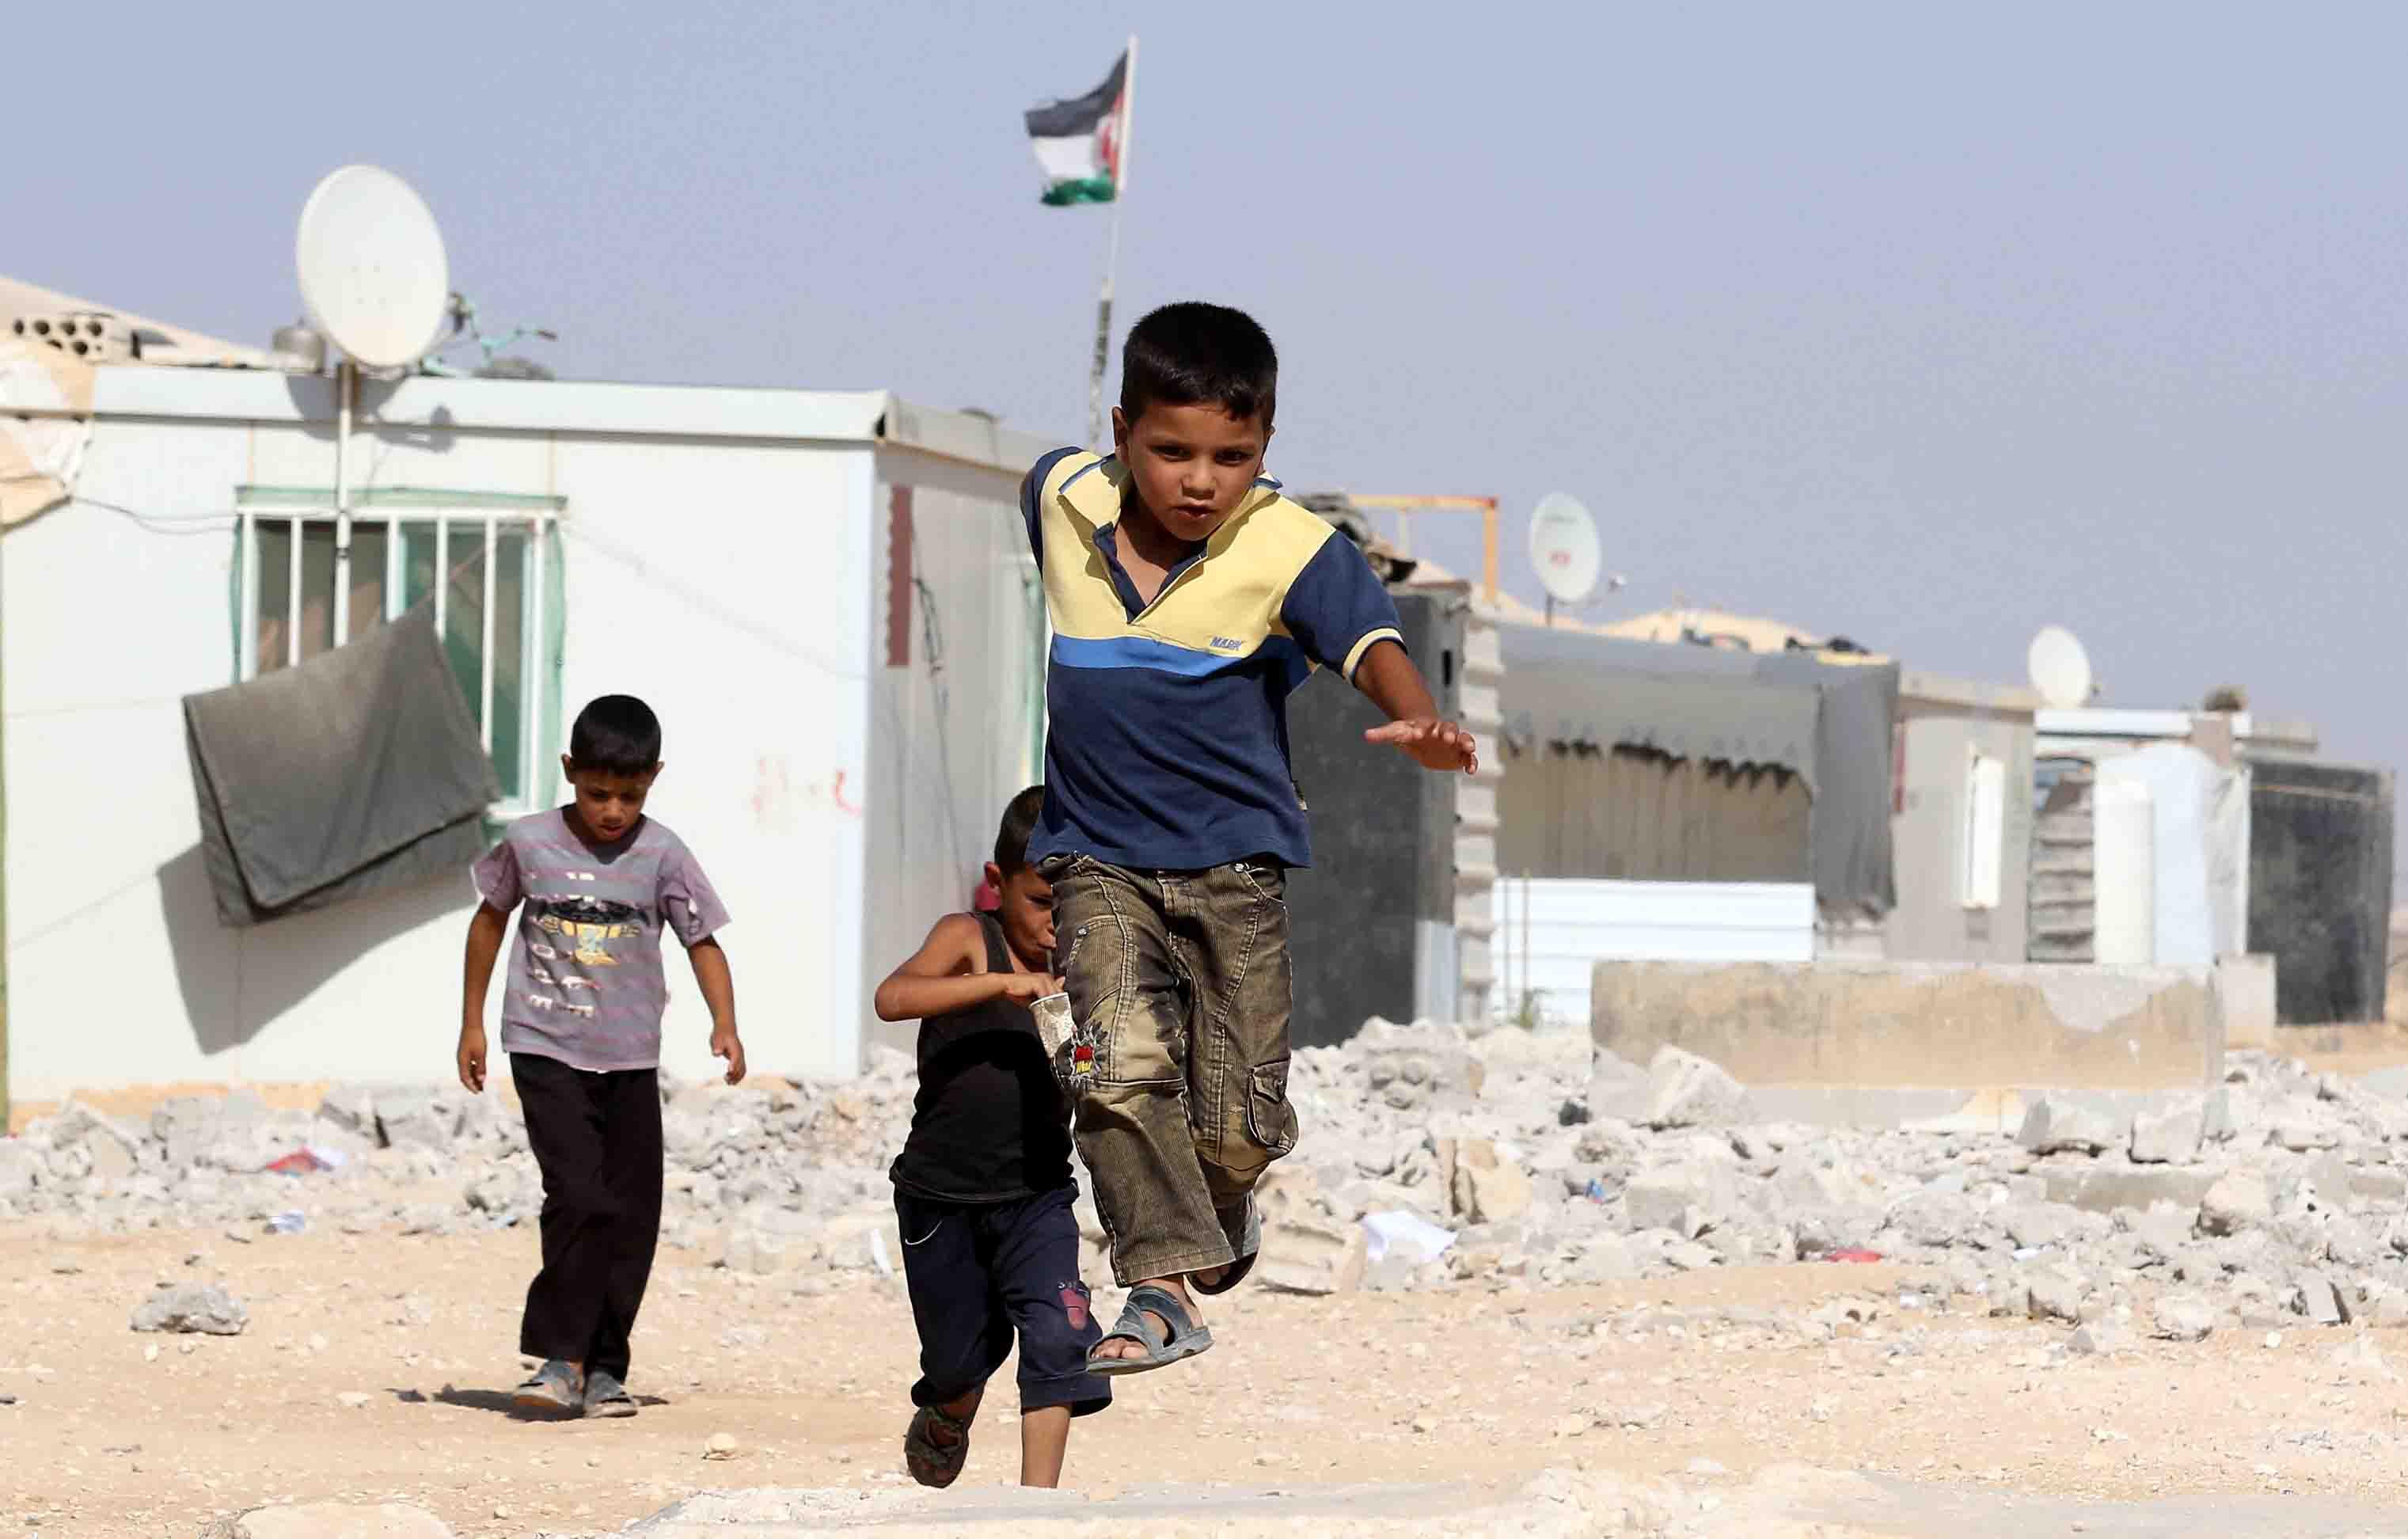 Syrian refugee boys play at the Zaatari refugee camp.